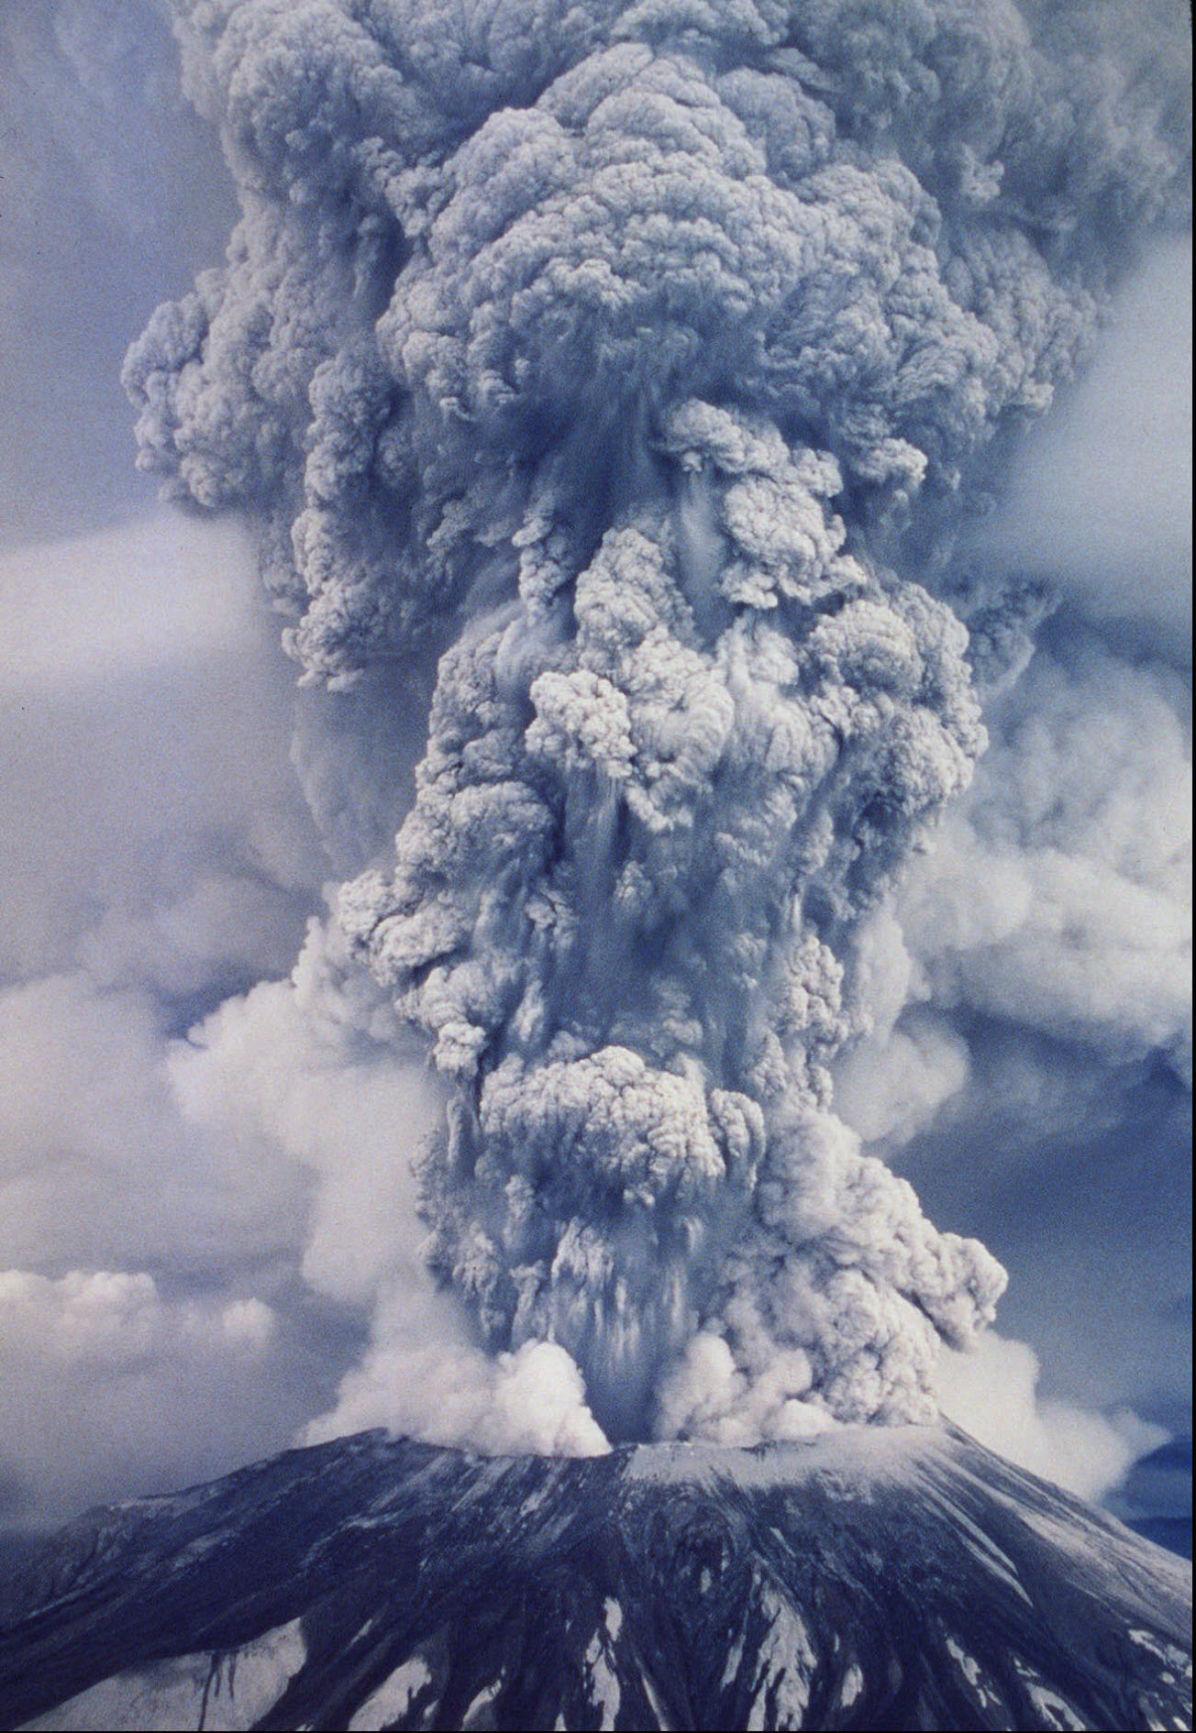 051720-adh-nws-Eruption01